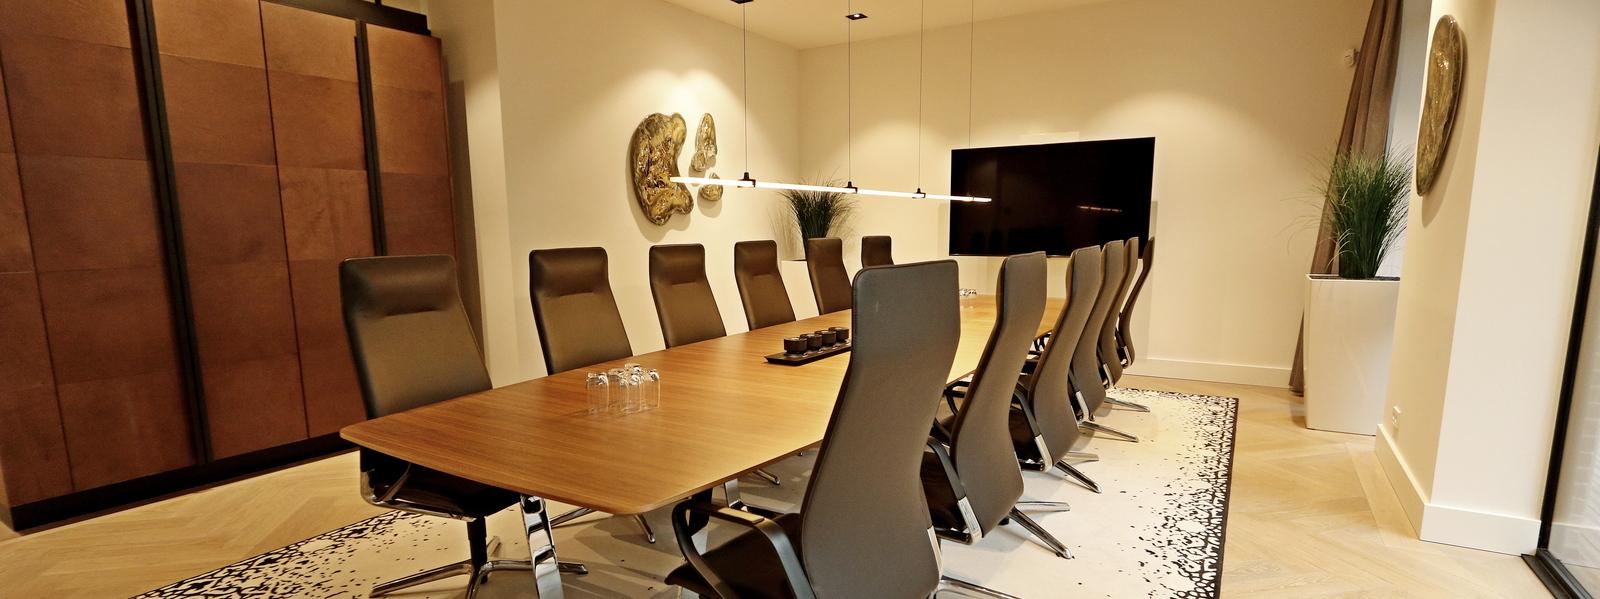 Perla referentie Lincoln International boardroom panorama